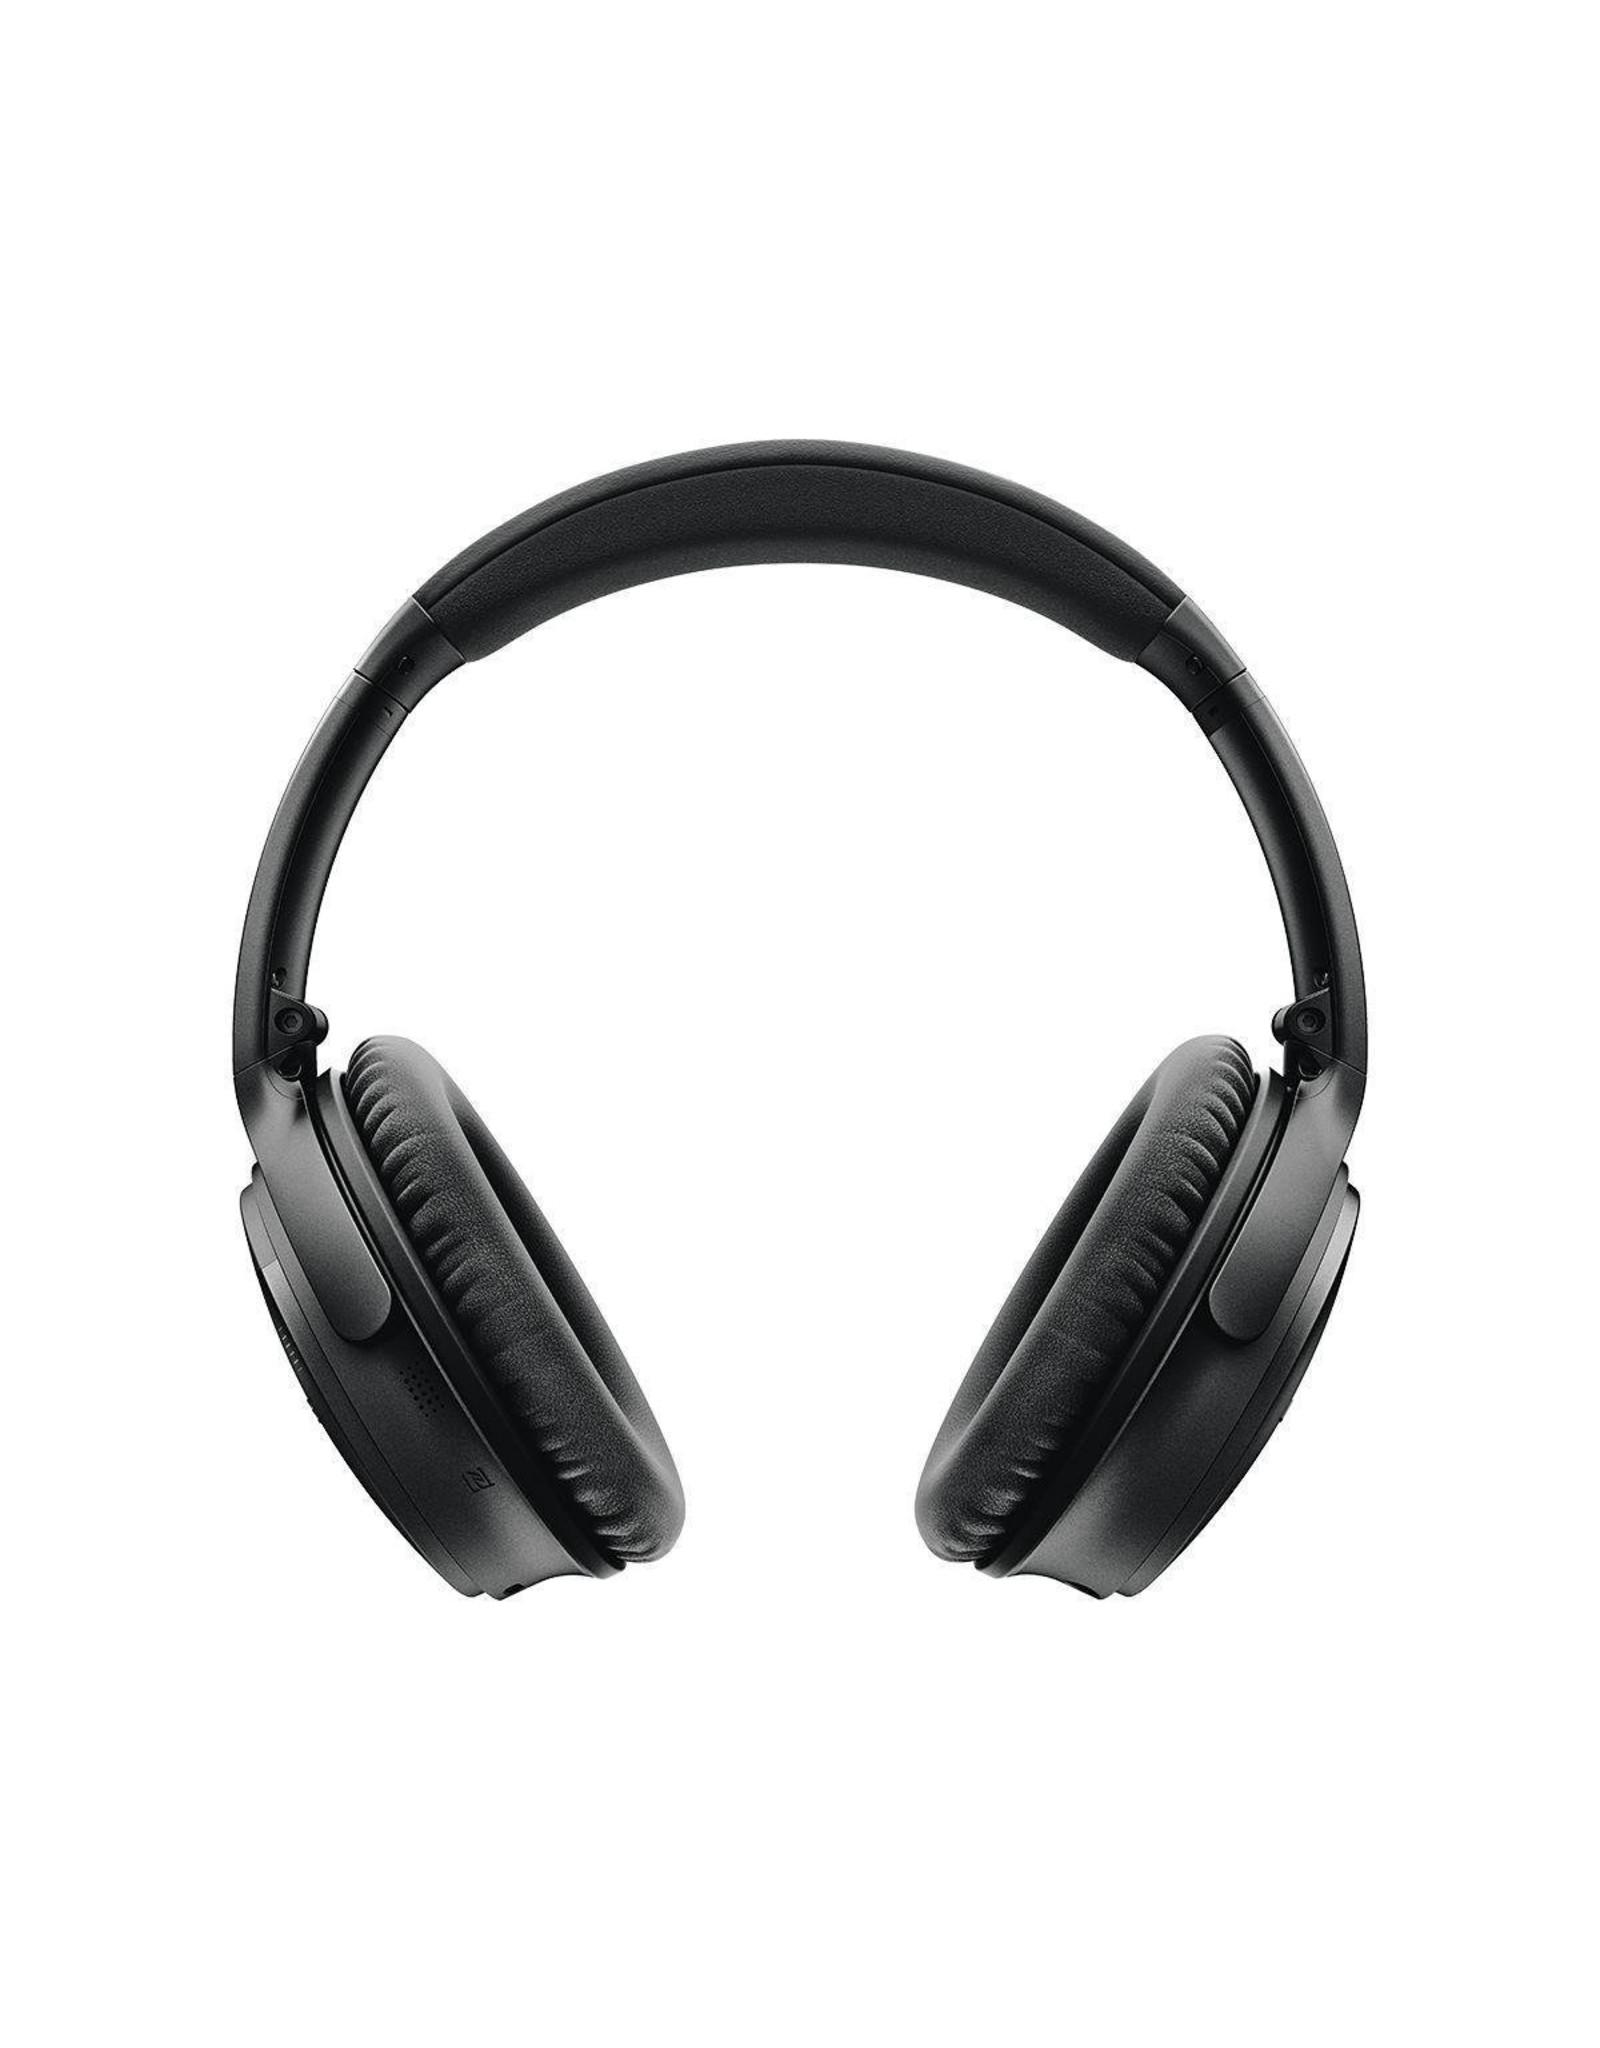 Bose Bose - QuietComfort 35 series II - Wireless over-ear headphones - Black